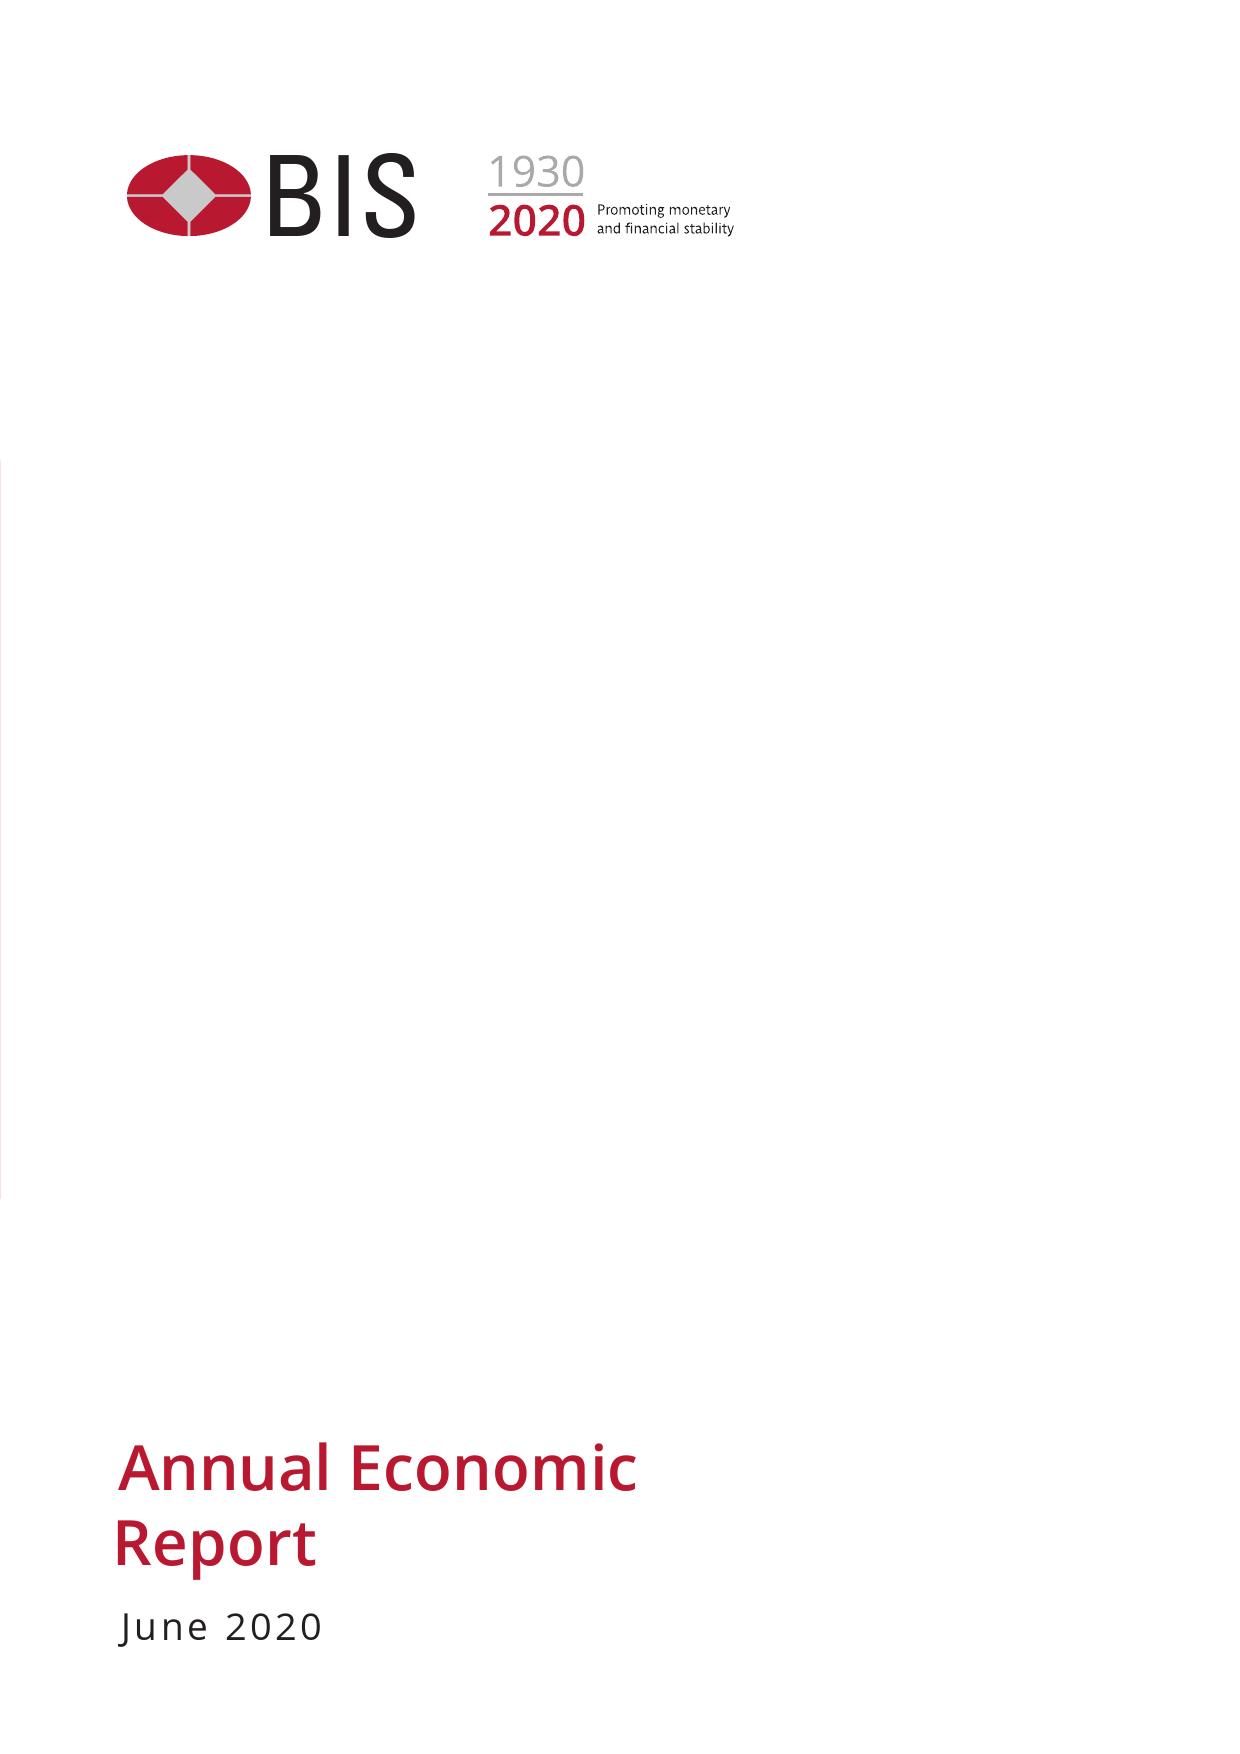 BIS:2020全球年度宏观经济报告(附下载)